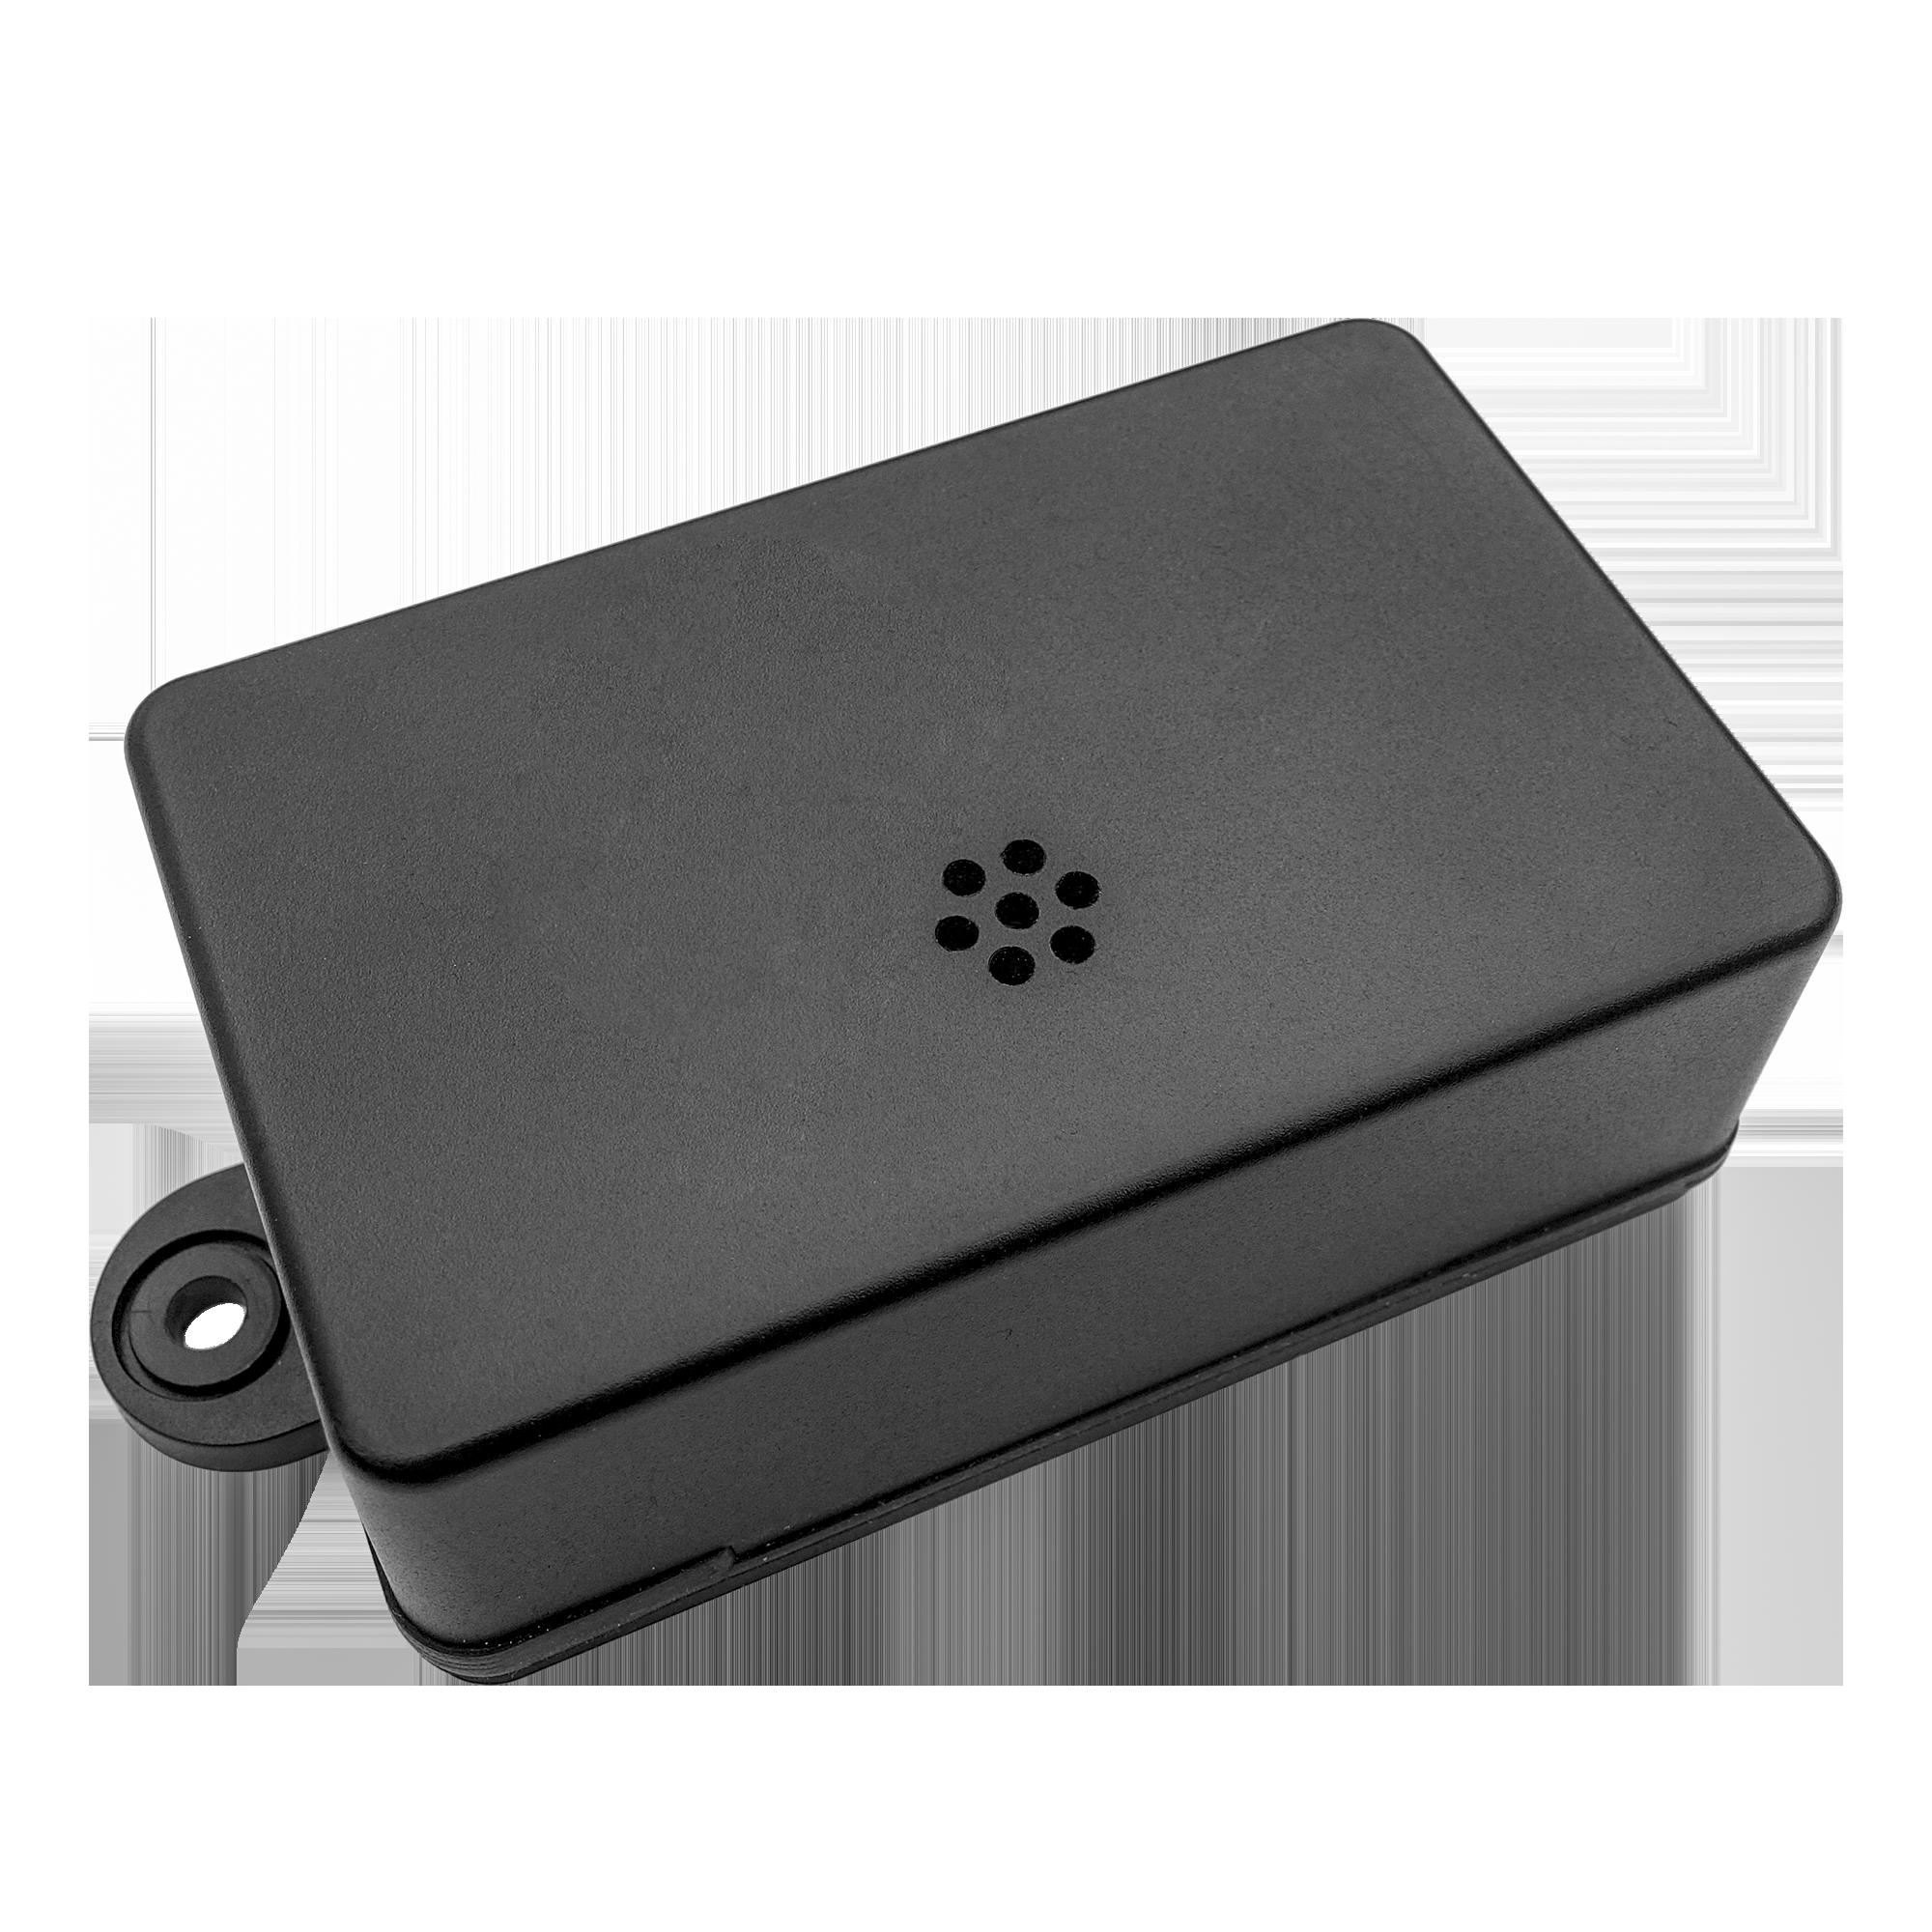 SKYLAB mini bluetooth 5.0 sdk uuid programmable ibeacon ble beacon